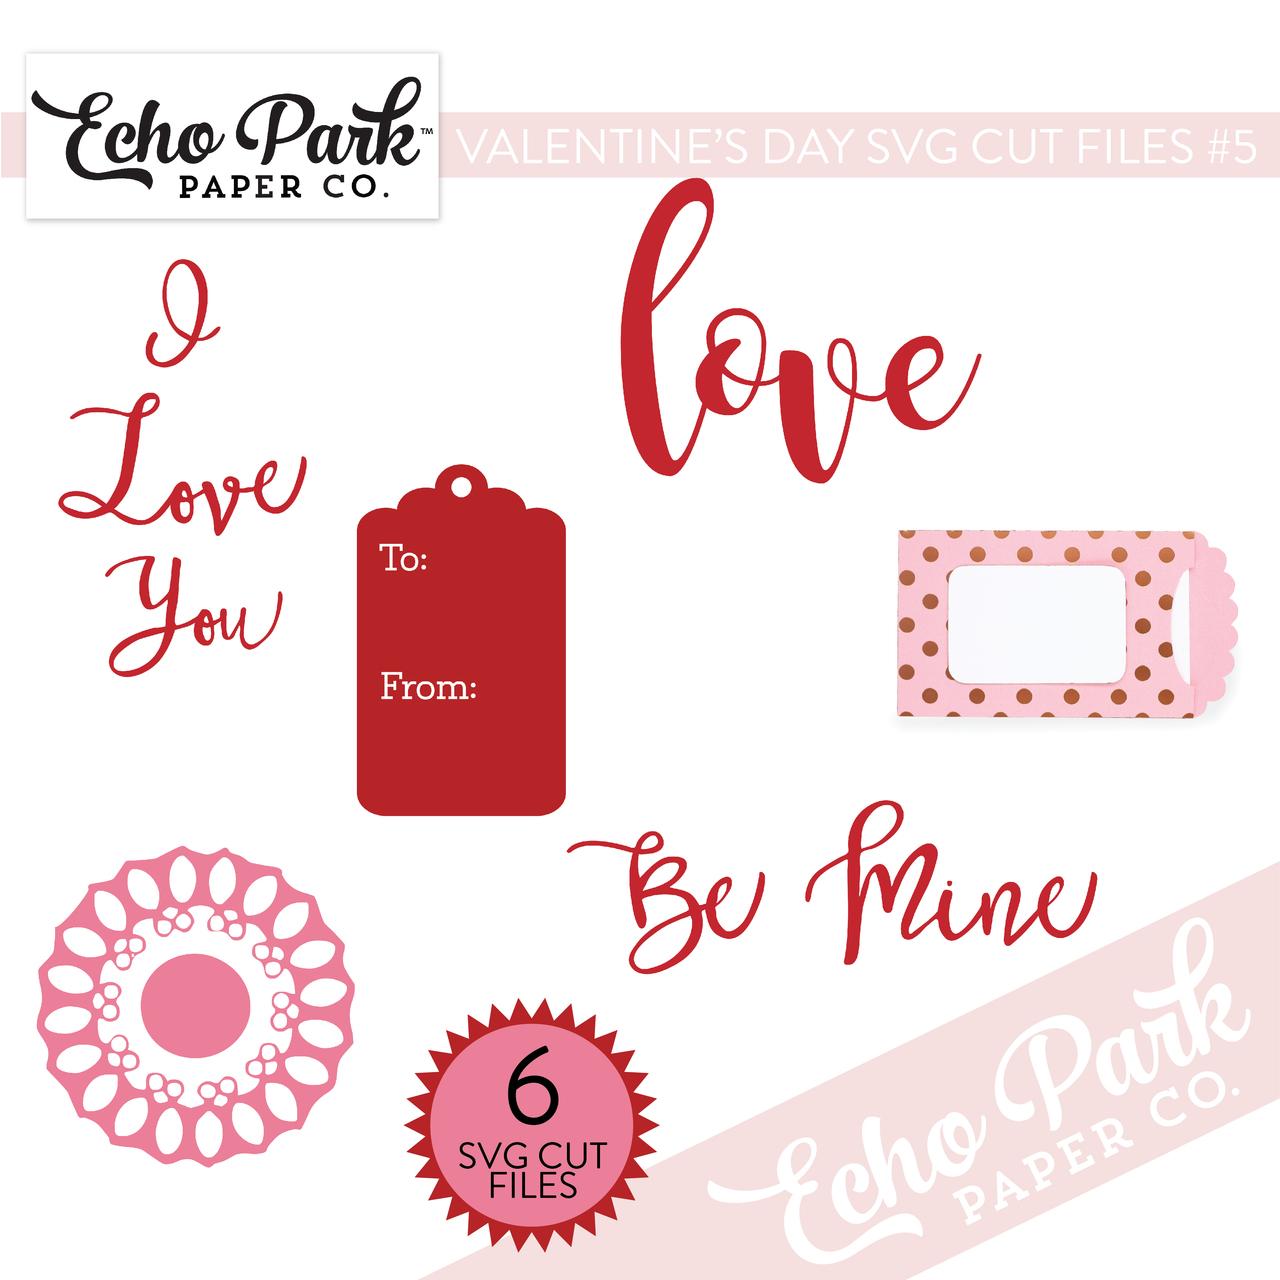 Valentines SVG Cut Files #5